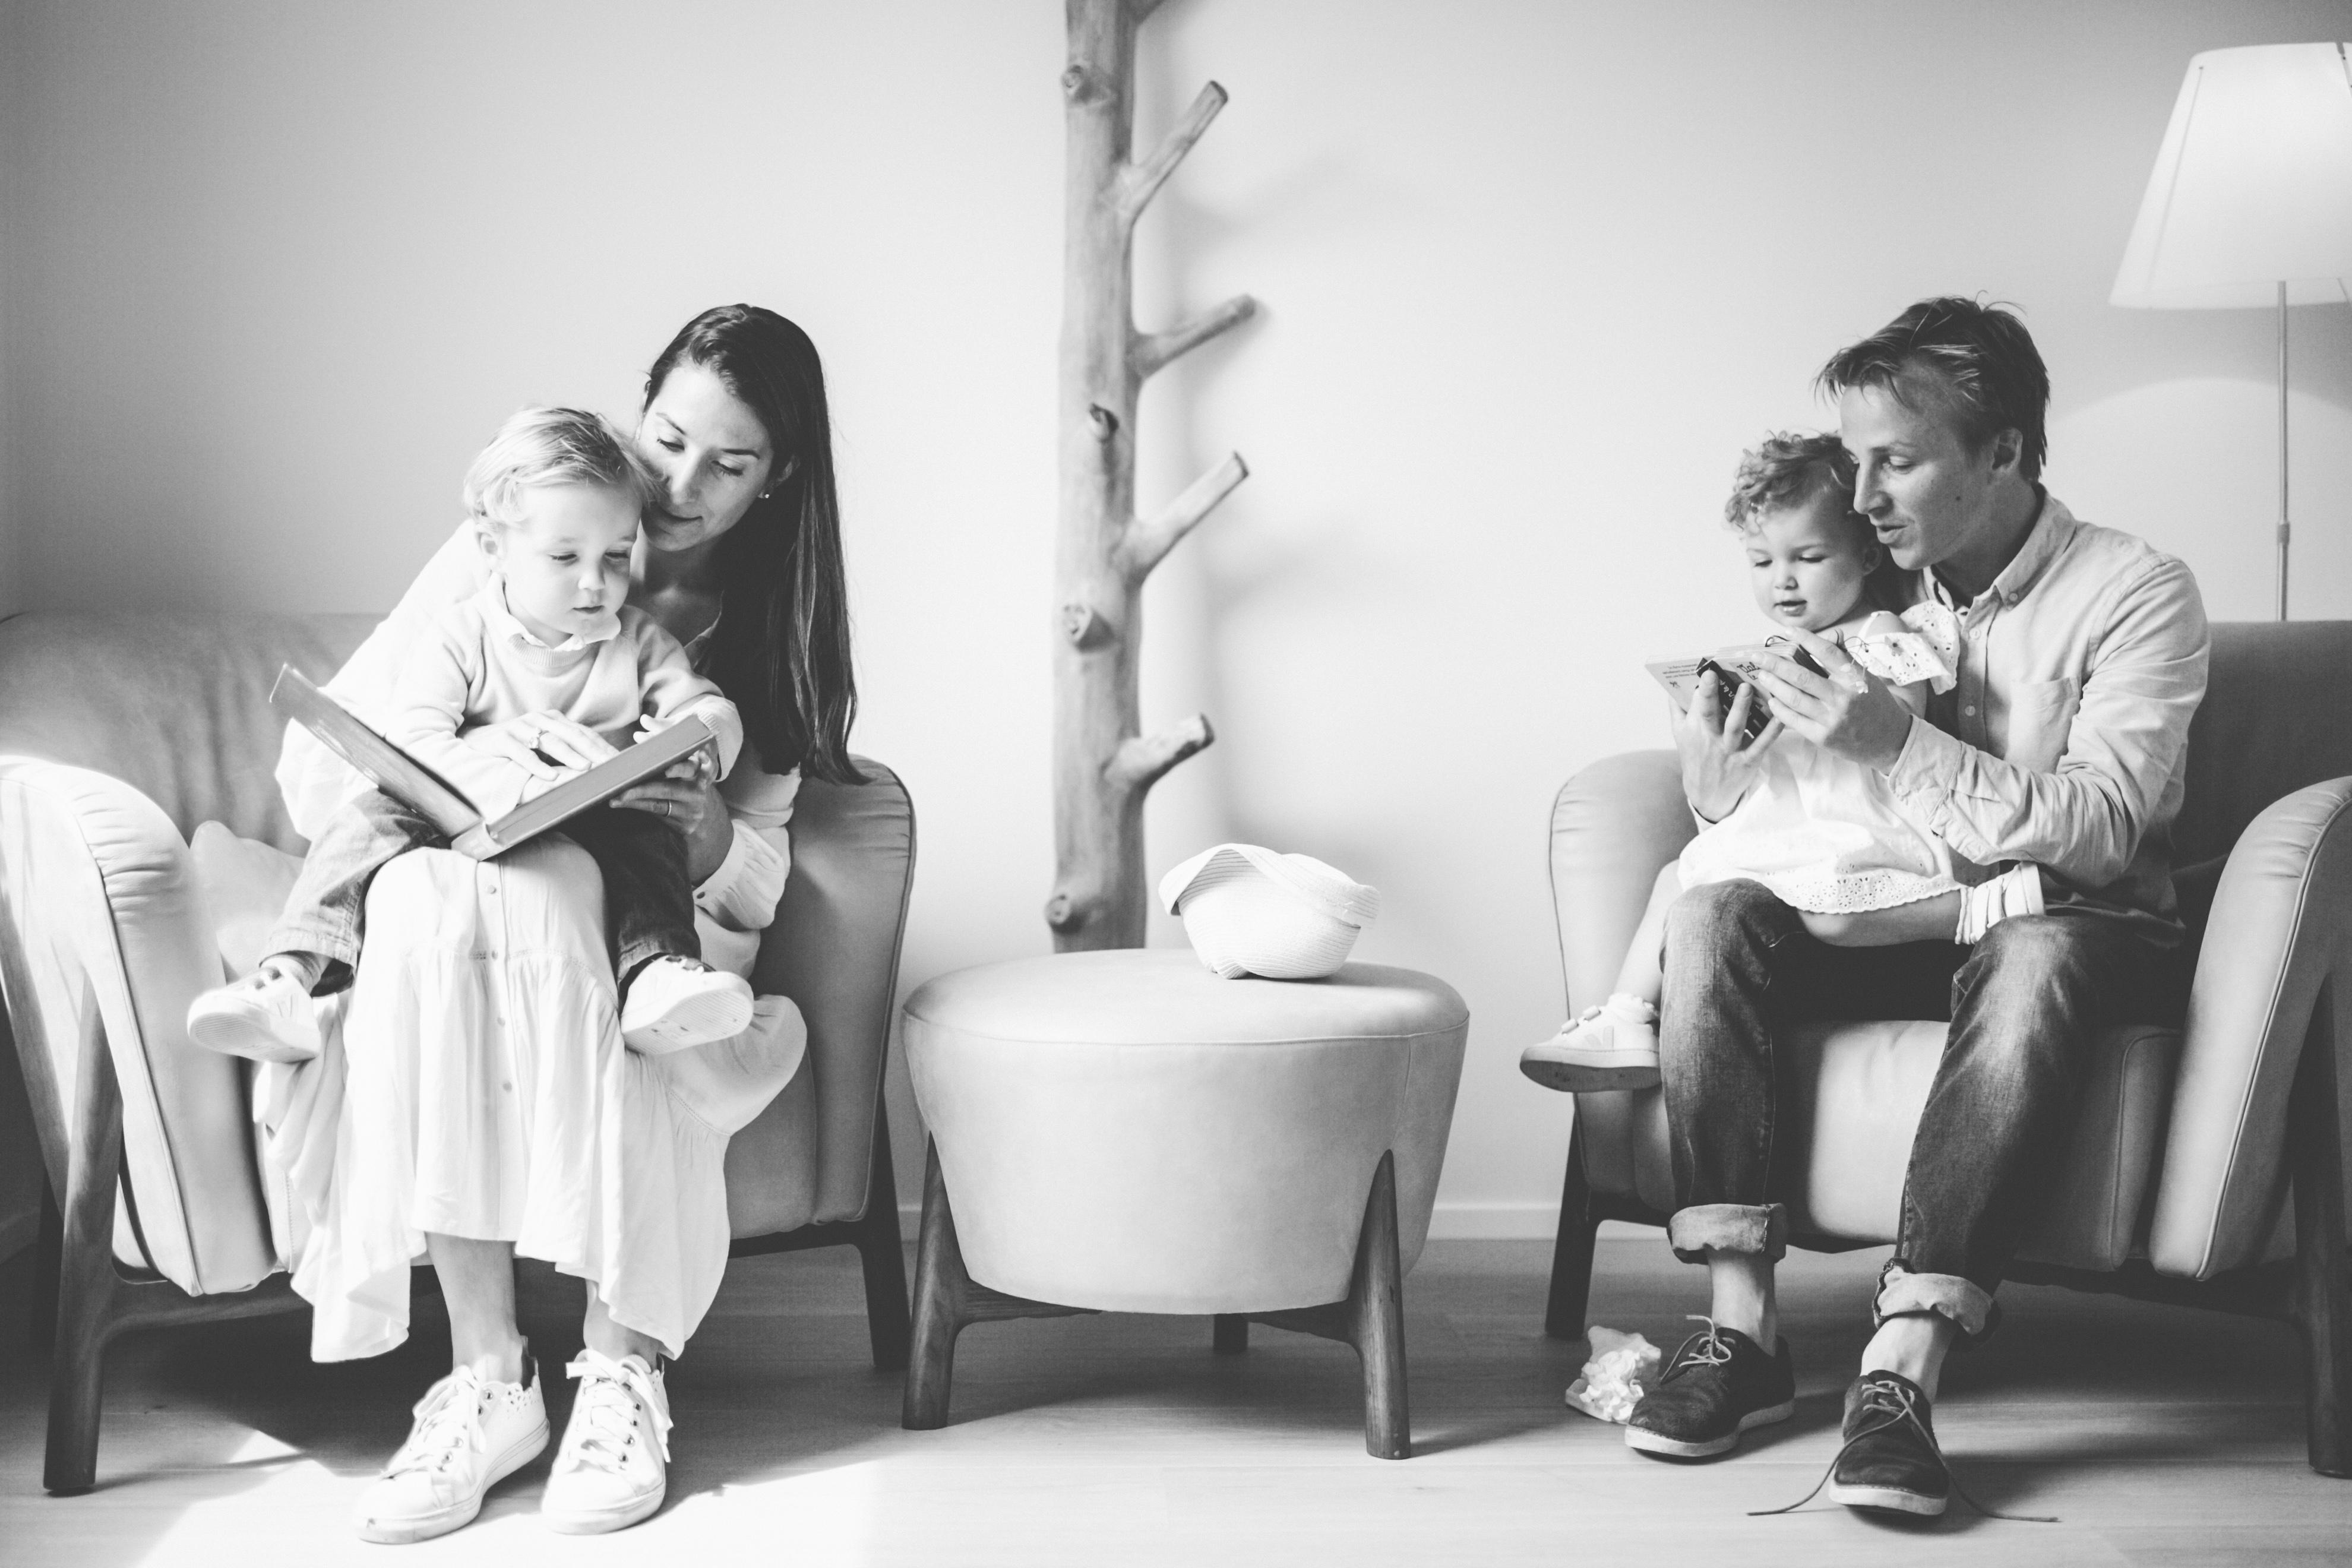 FAMILIE DE MULDER-5921